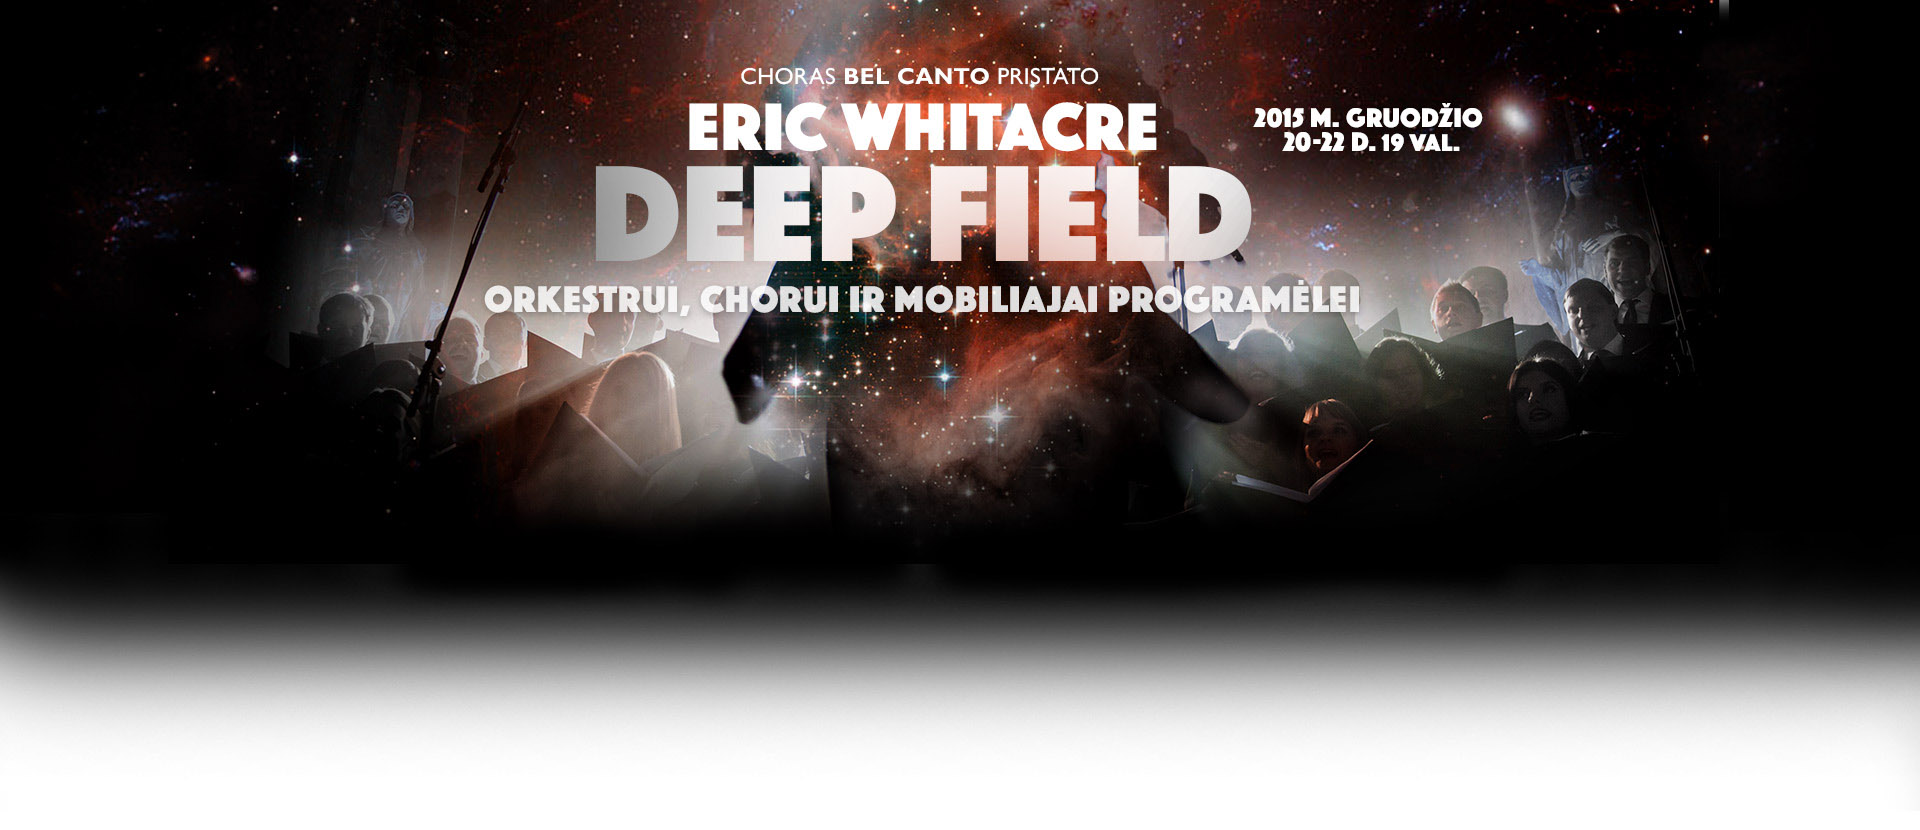 Choras Bel Canto: Deep Field premjera Lietuvoje!